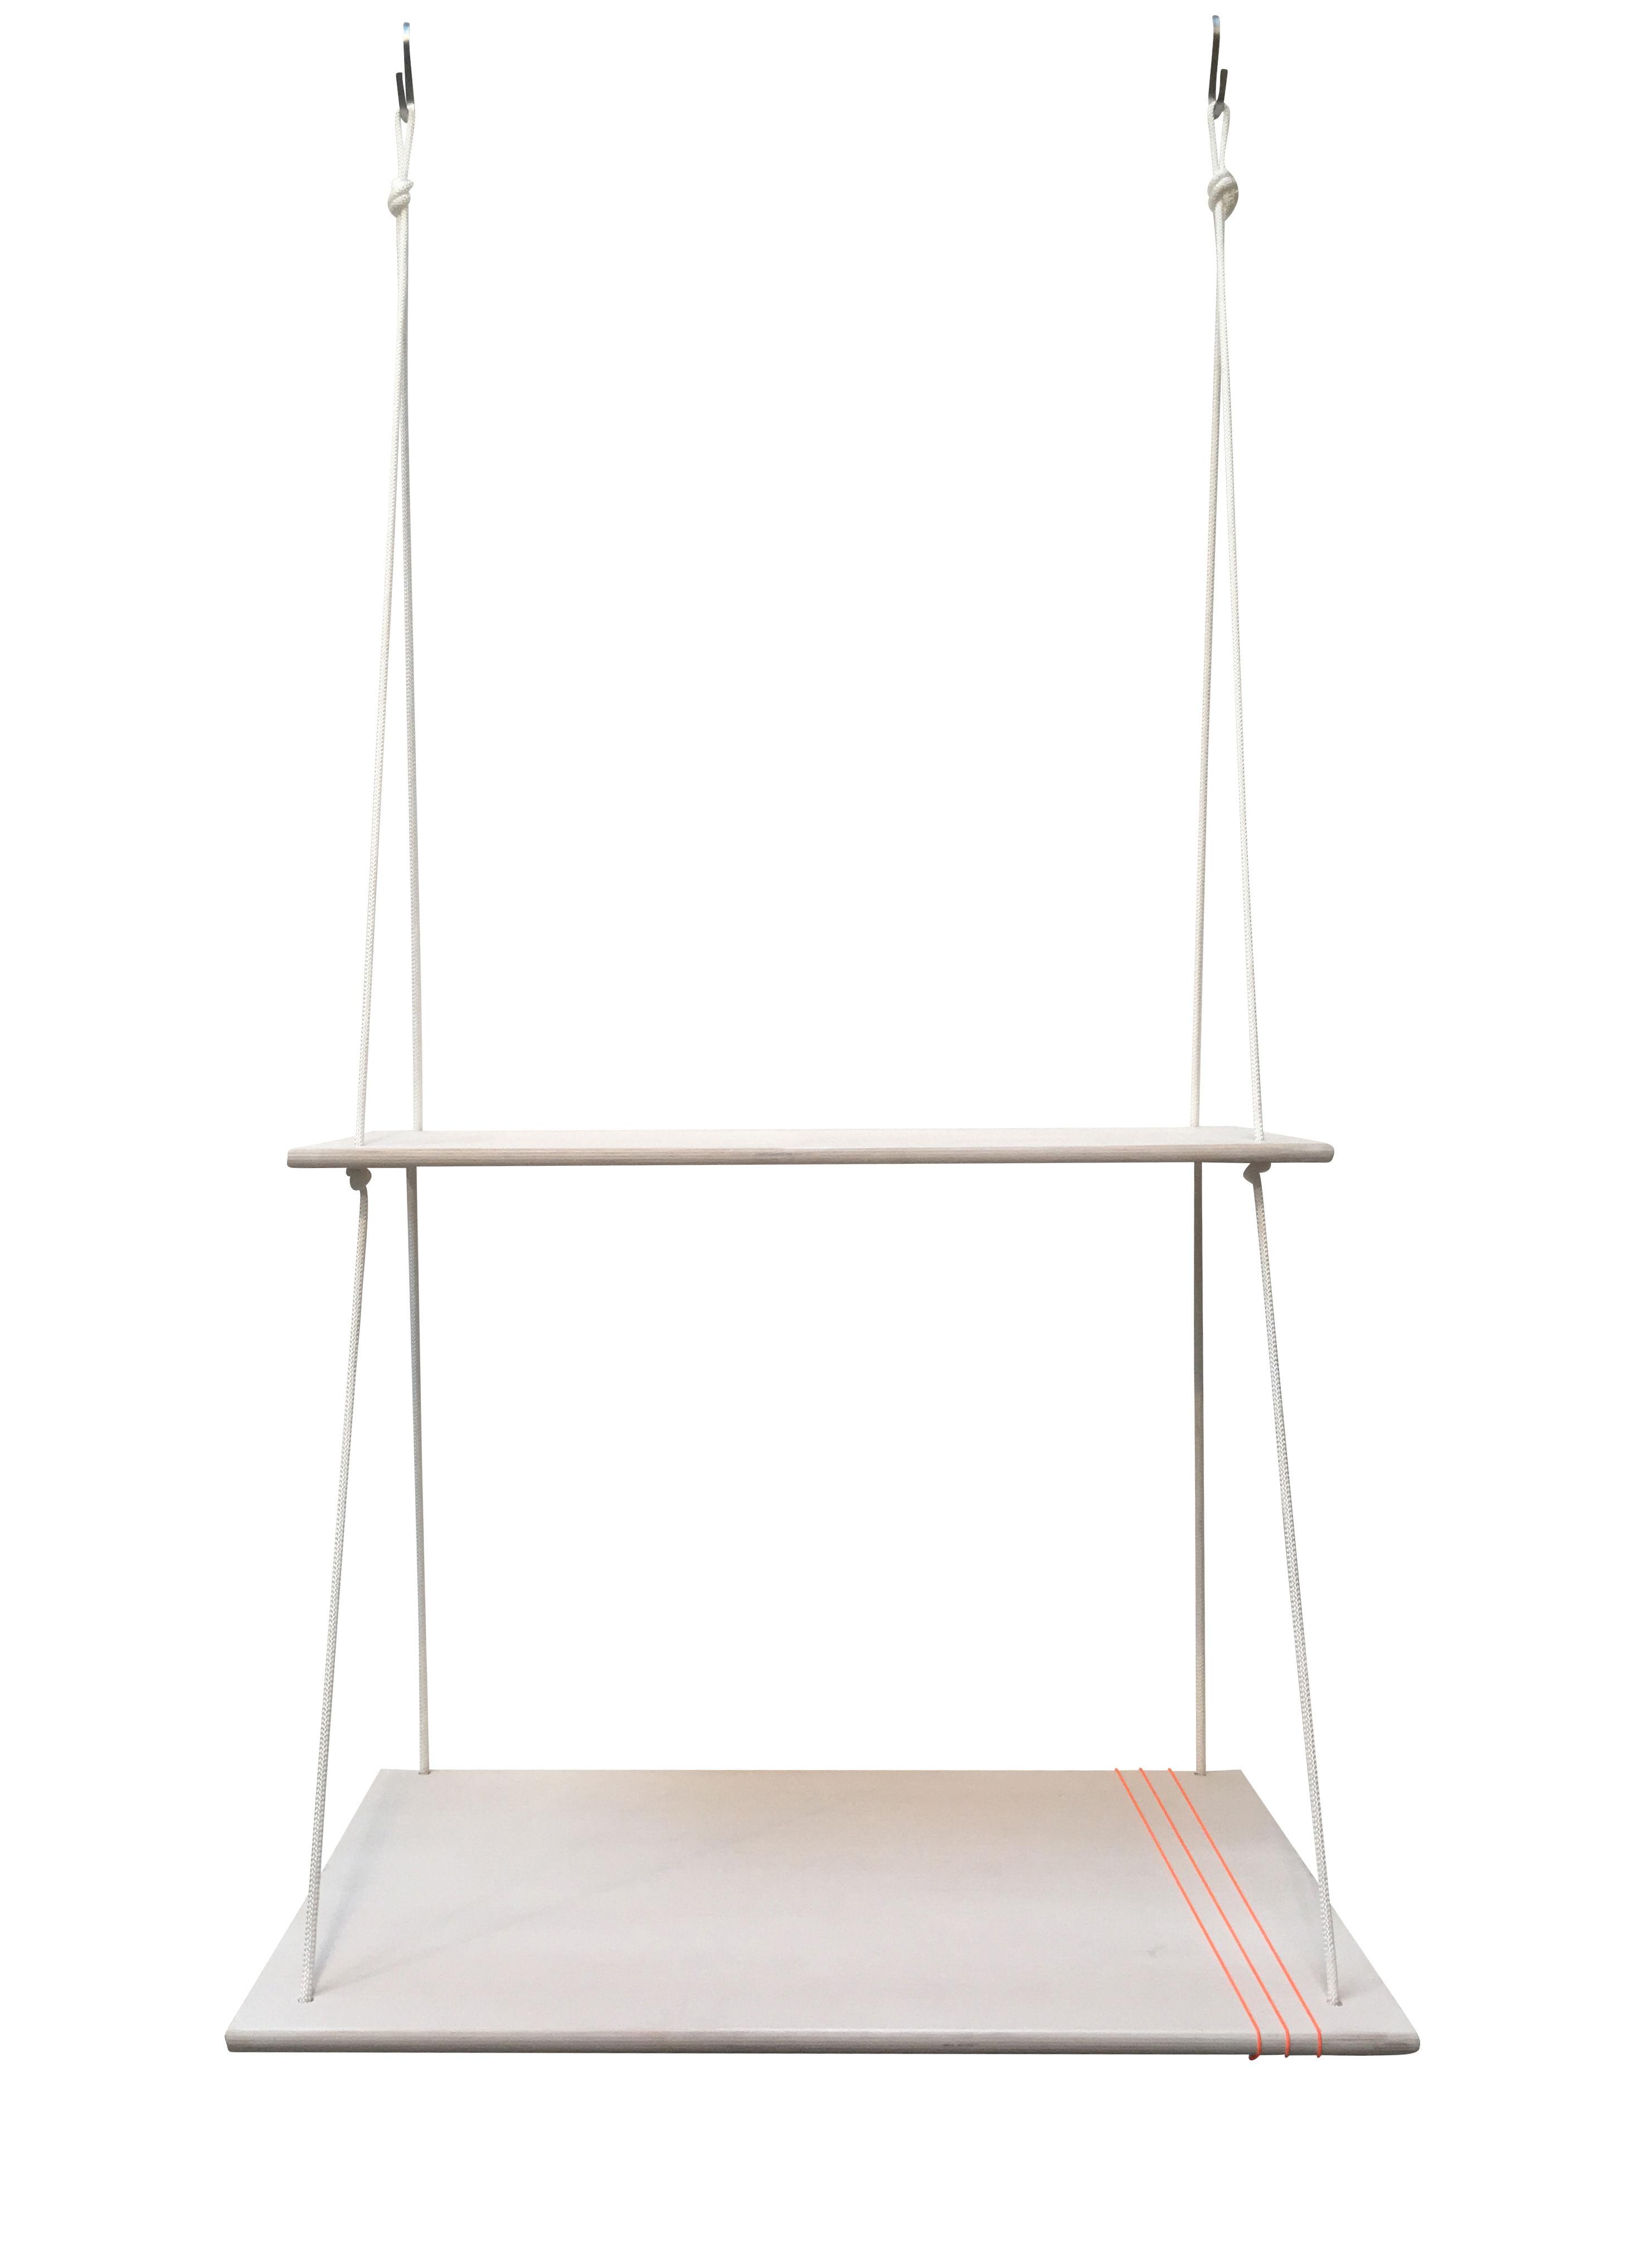 Furniture - Kids Furniture - Hang Desk Desk - L 90 x D 55 cm by Trimm Copenhagen - White - Birch veneer, Rope